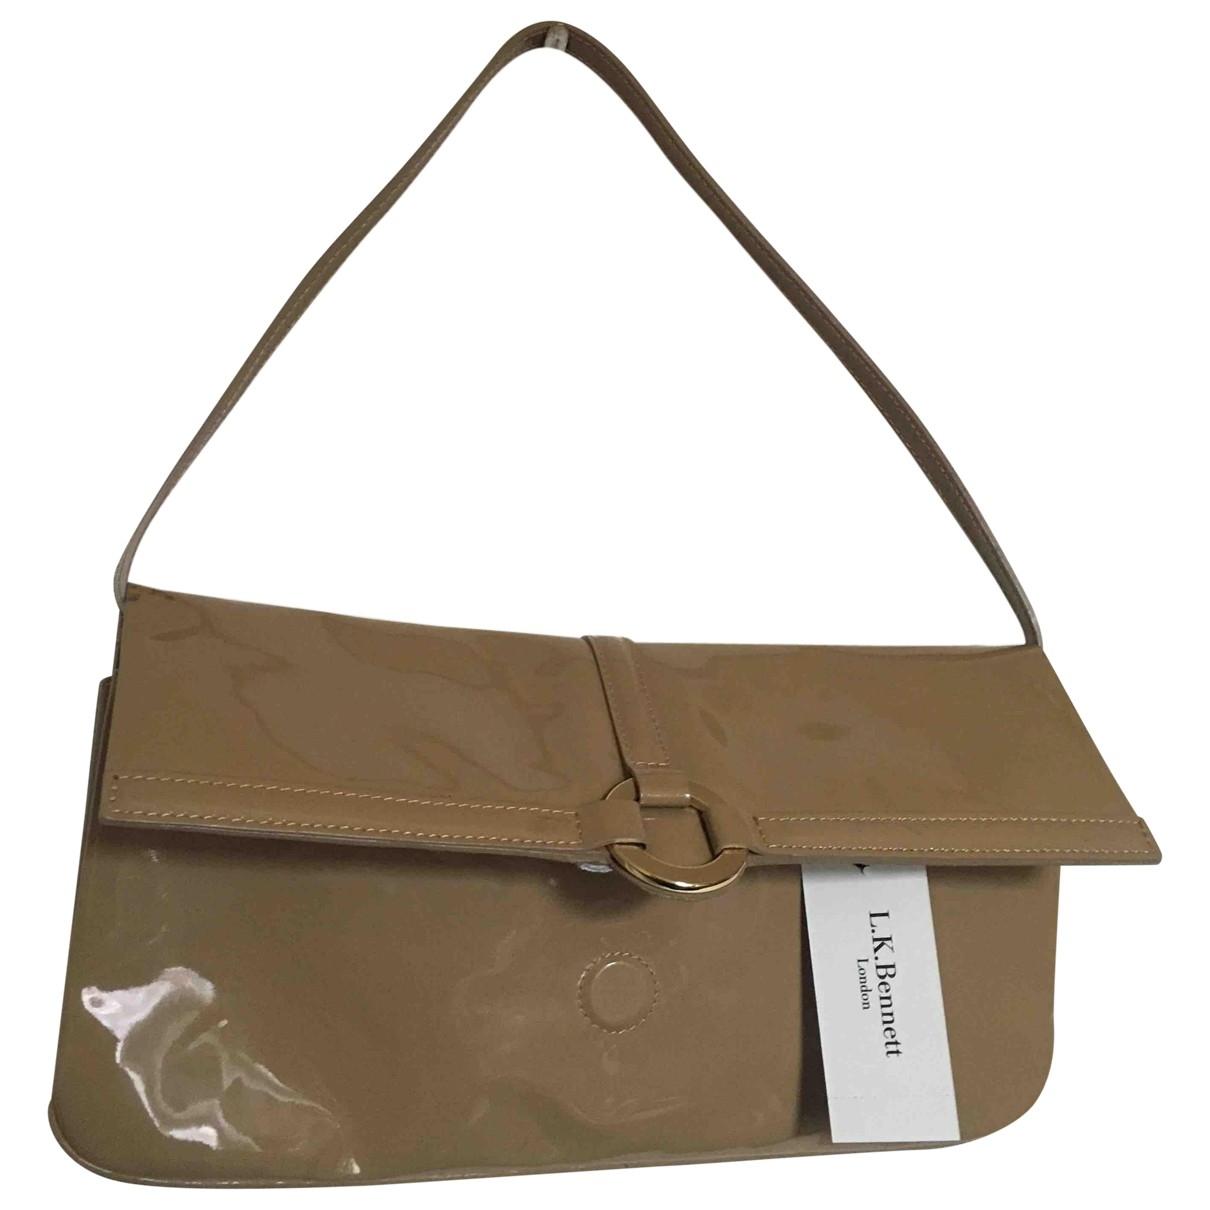 Lk Bennett \N Brown Patent leather Clutch bag for Women \N